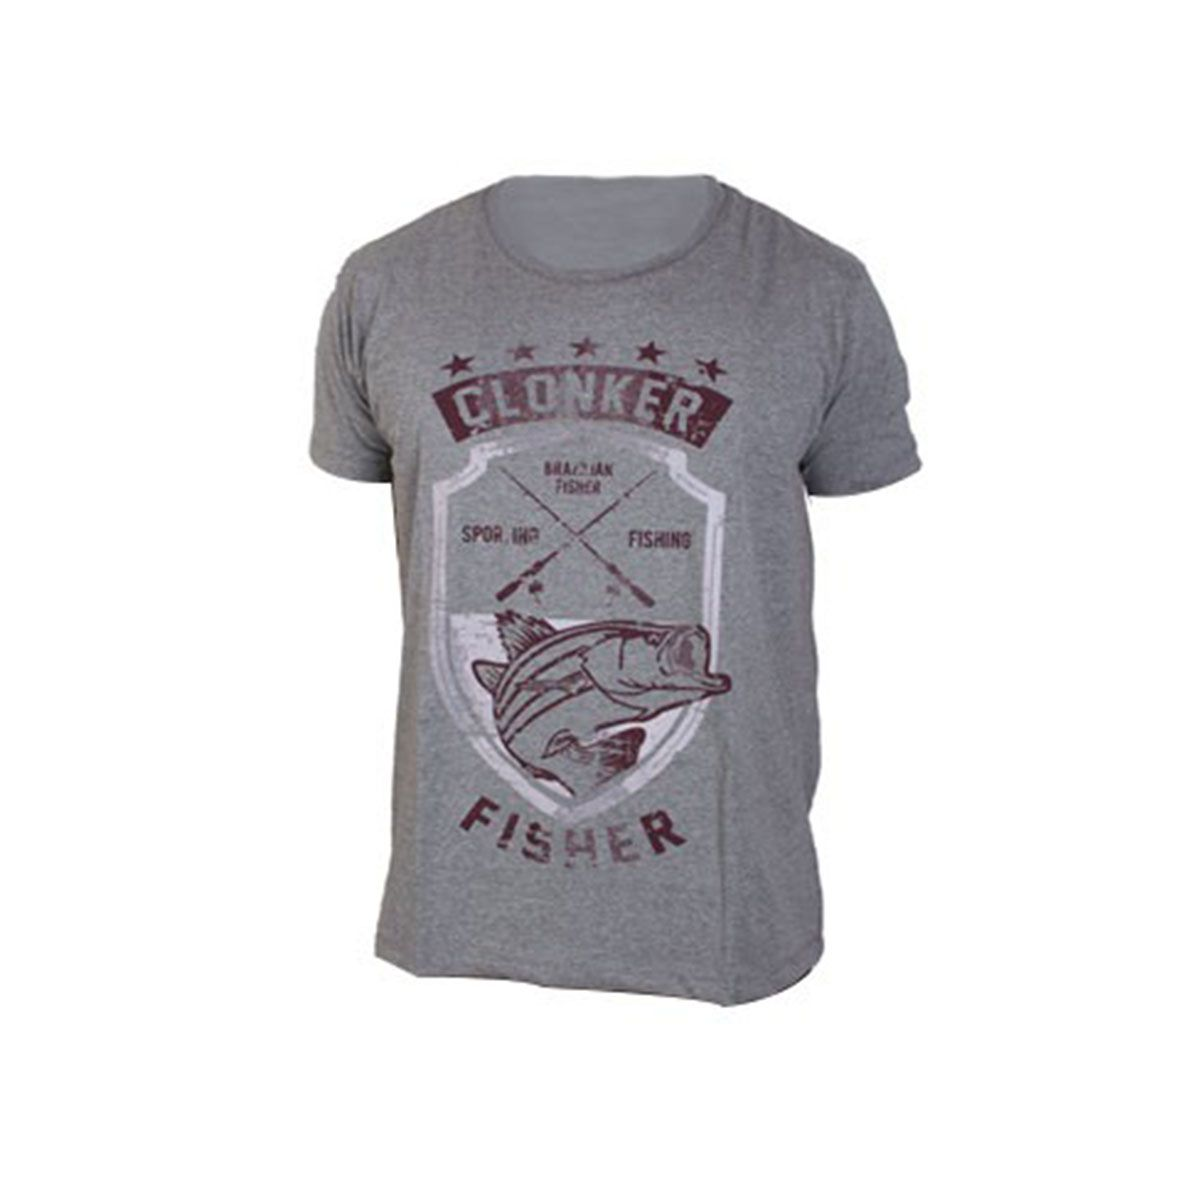 Camiseta Clonker Malha Mescla Braz. Fisher